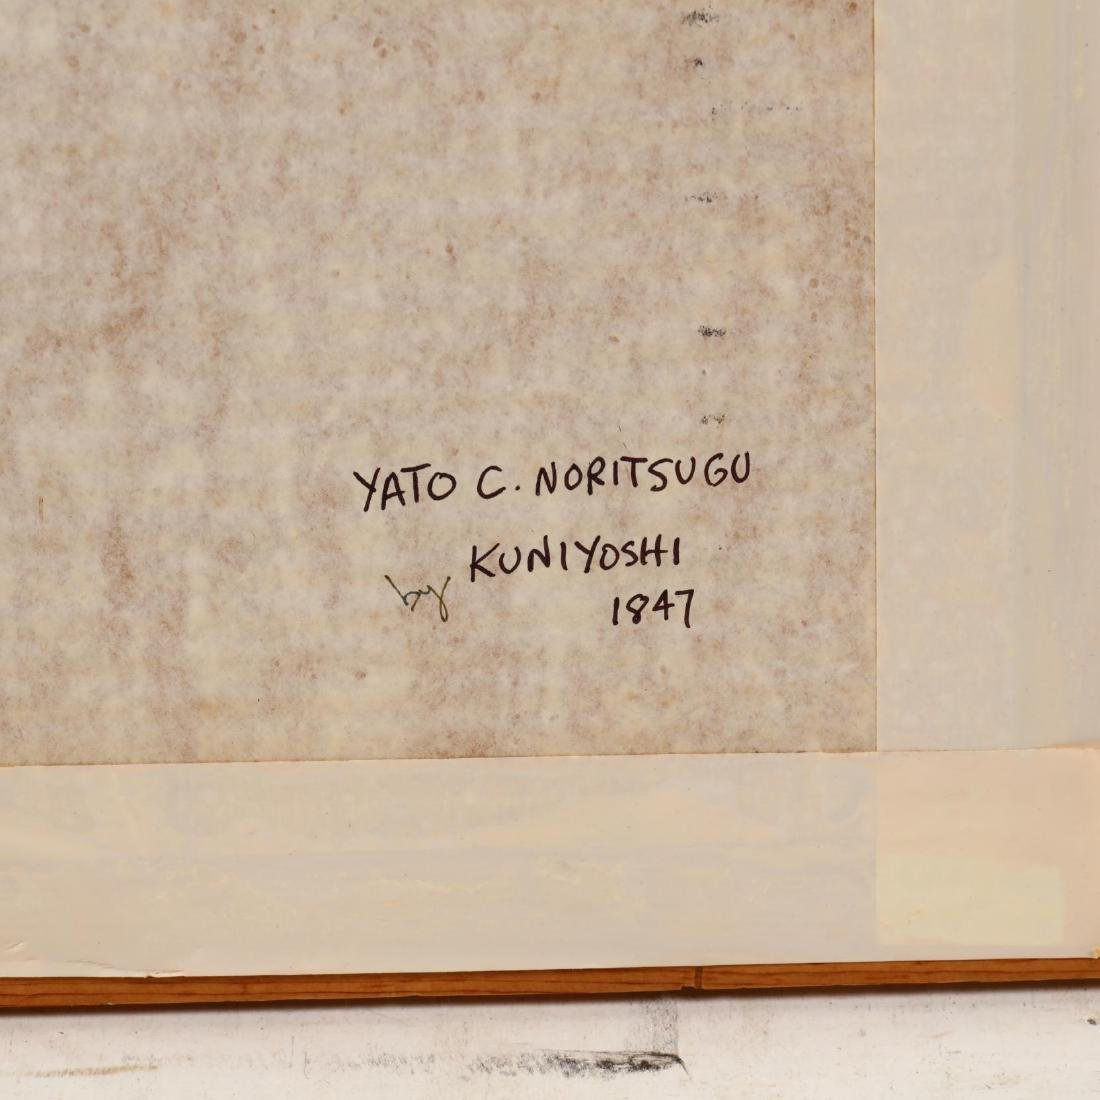 Two Japanese Woodblock Prints by Kunisada and Kuniyoshi - 6